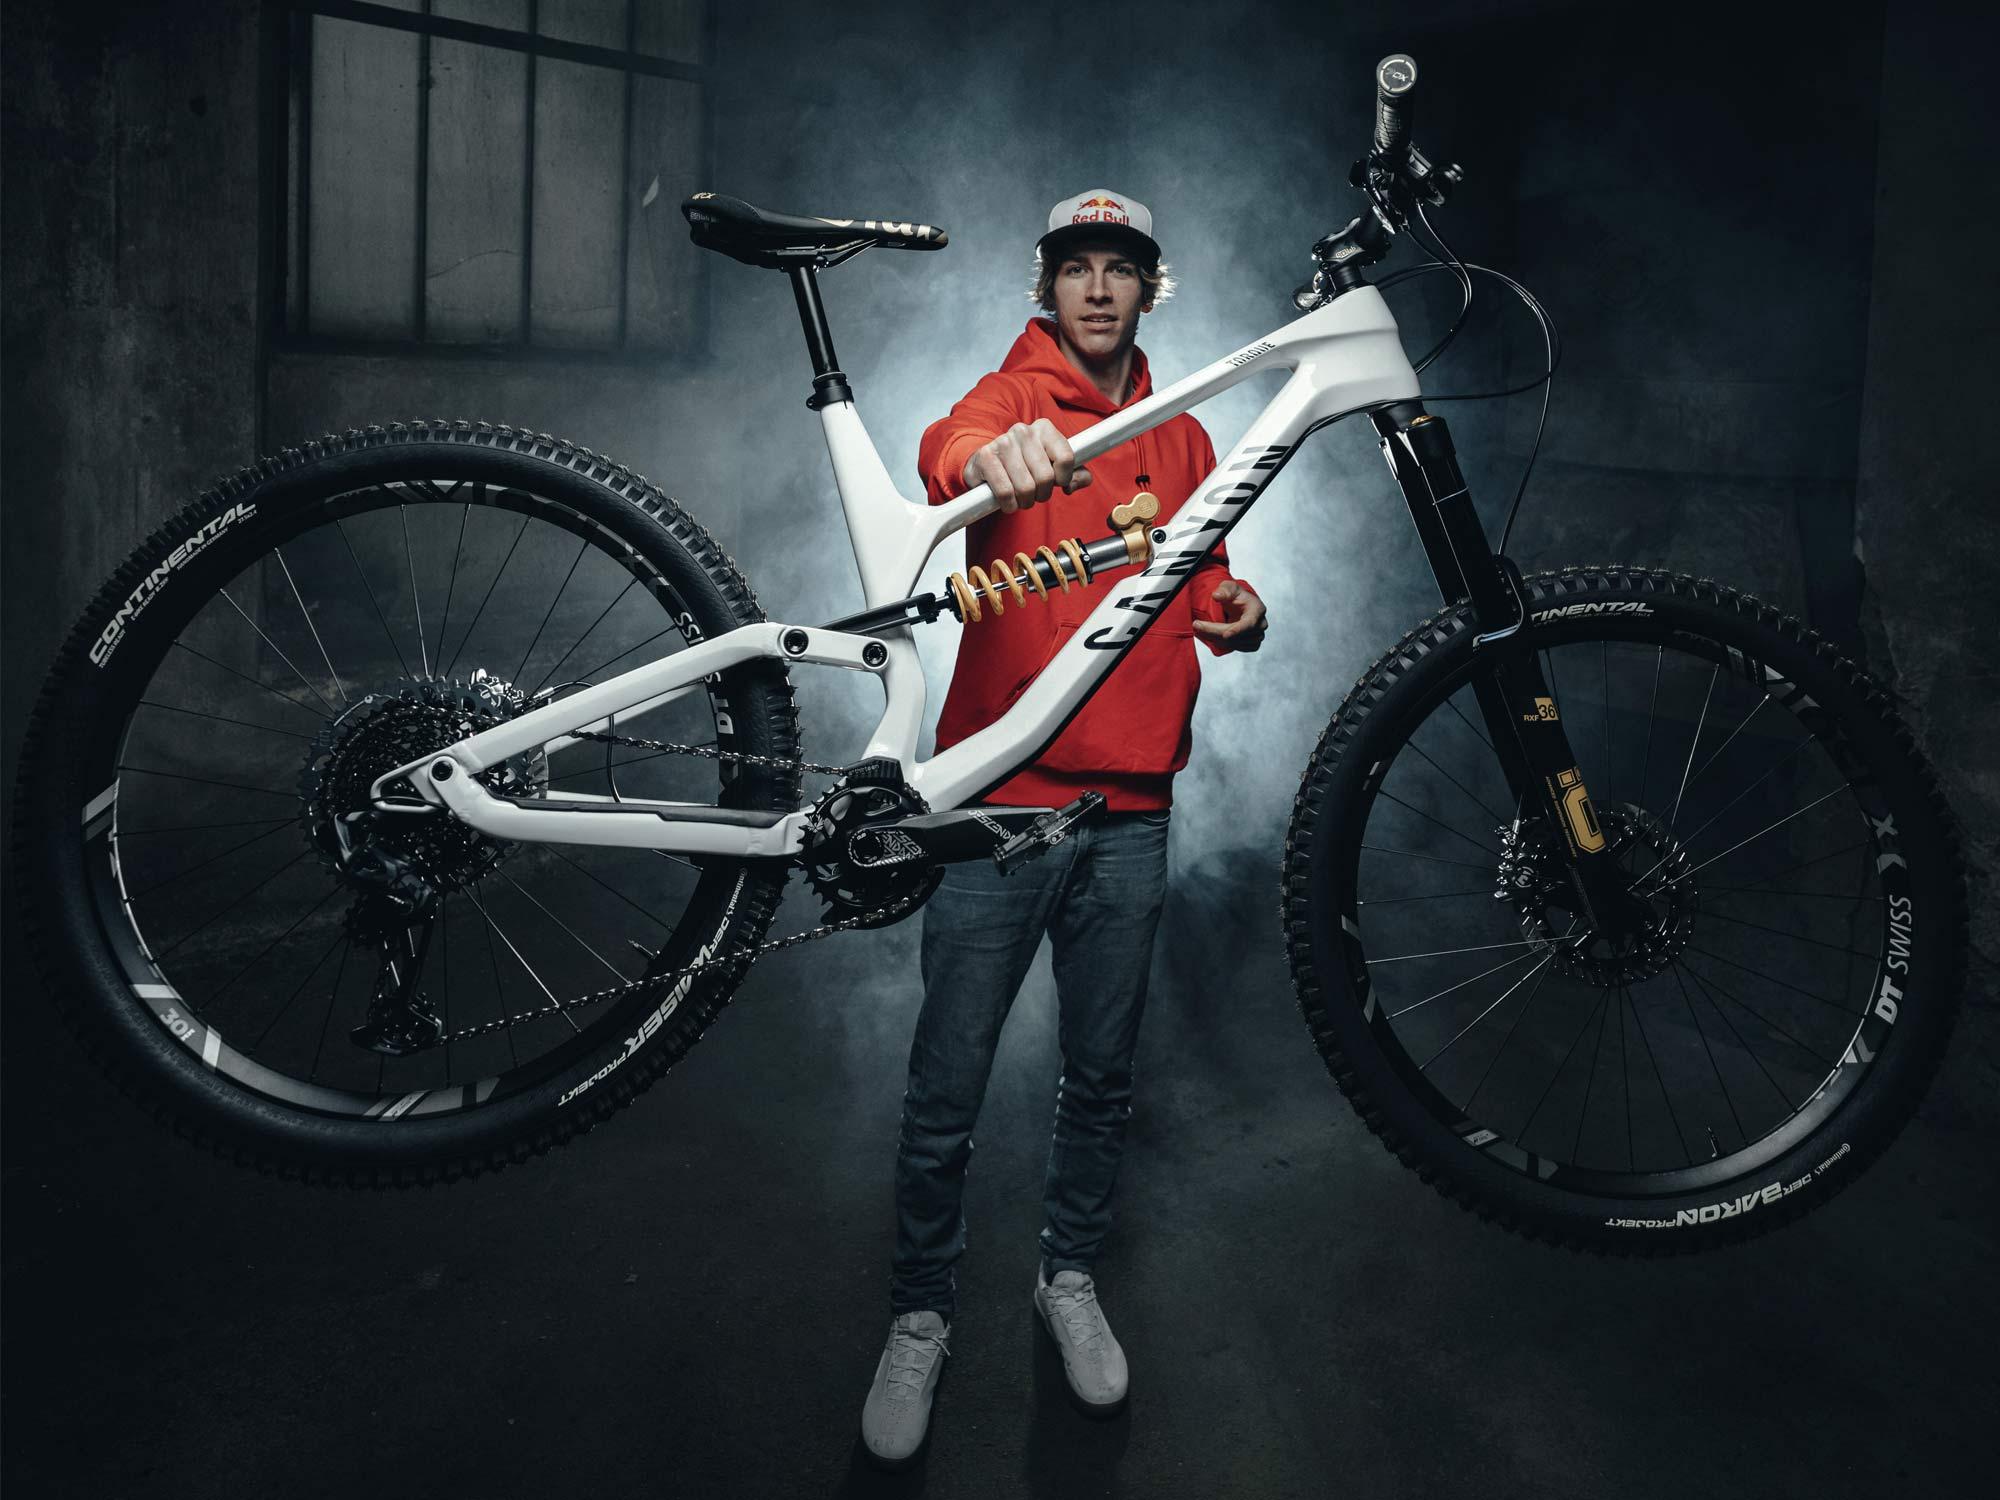 Canyon Torque CF Fabio Wibmer bici da enduro in edizione limitata